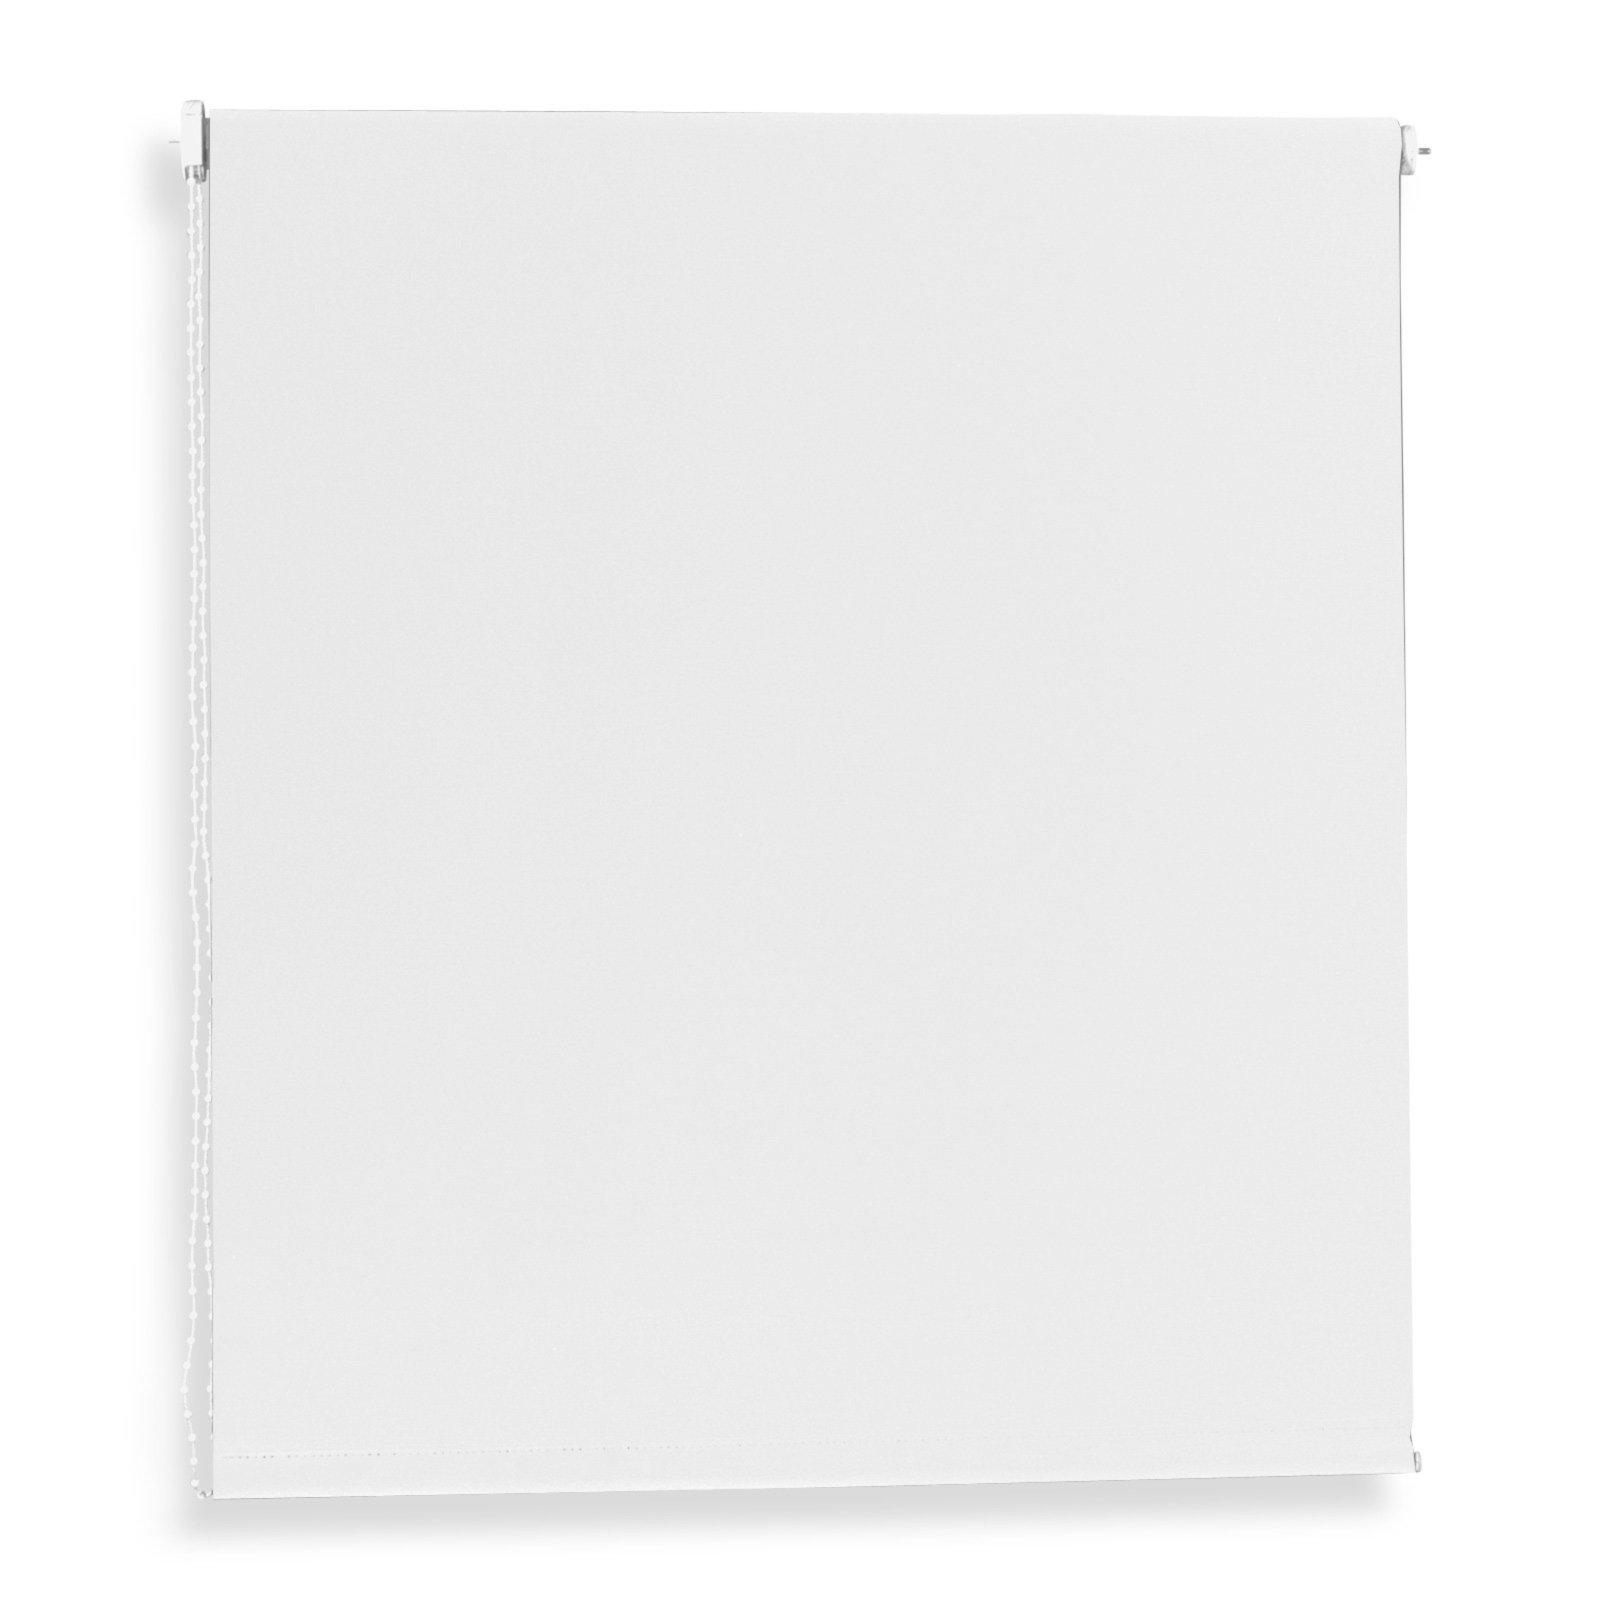 Rollo - weiß - 180x180 cm